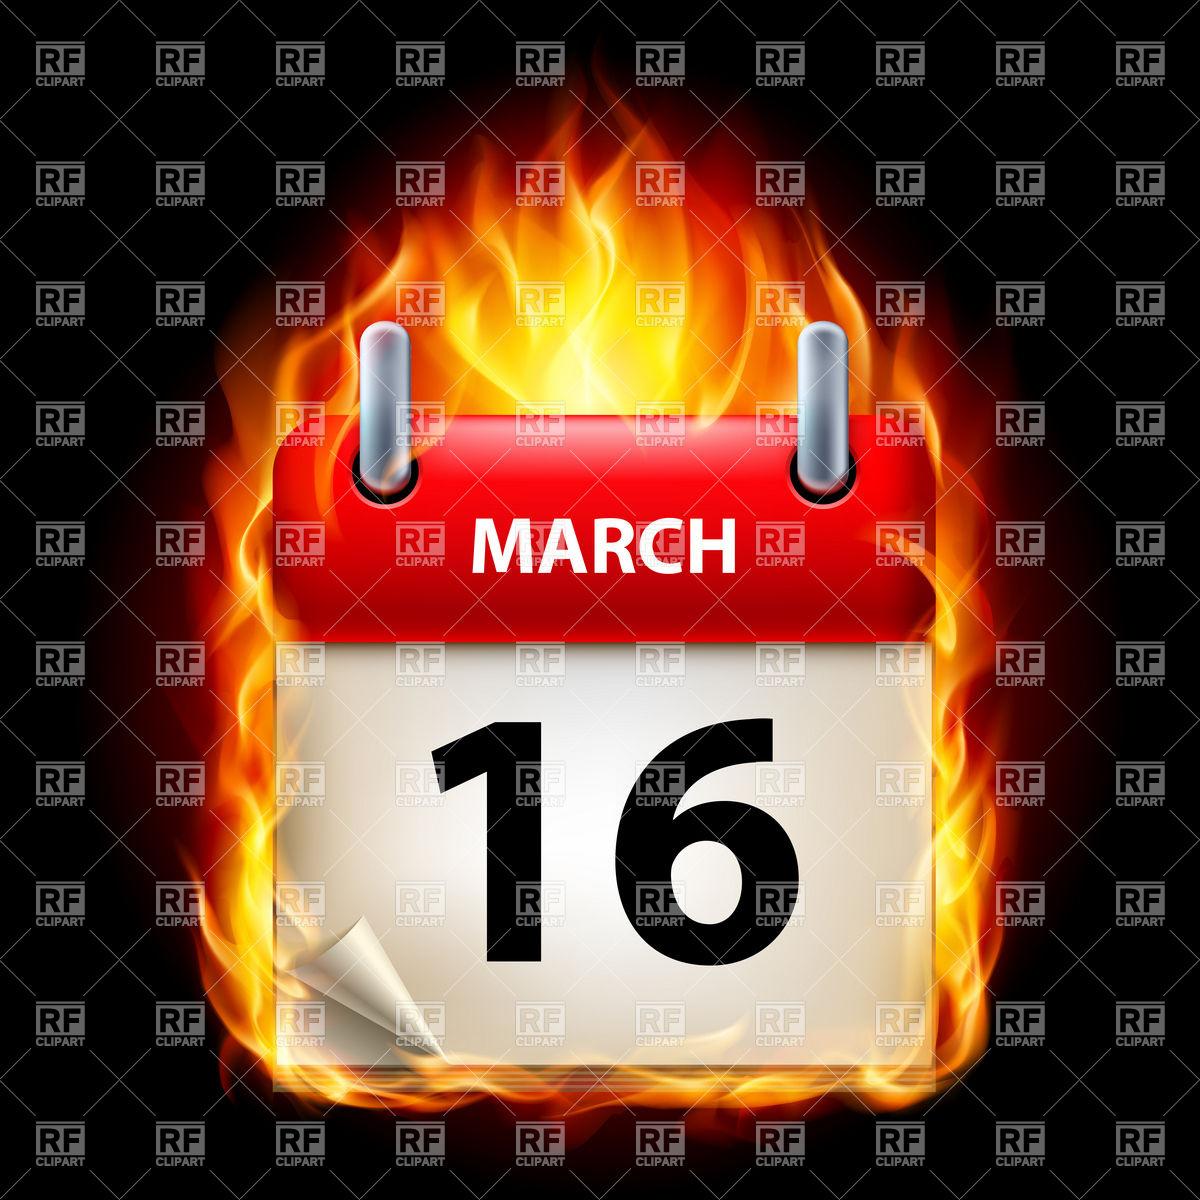 Fiery calendar icon March 16 Vector Image #8901.